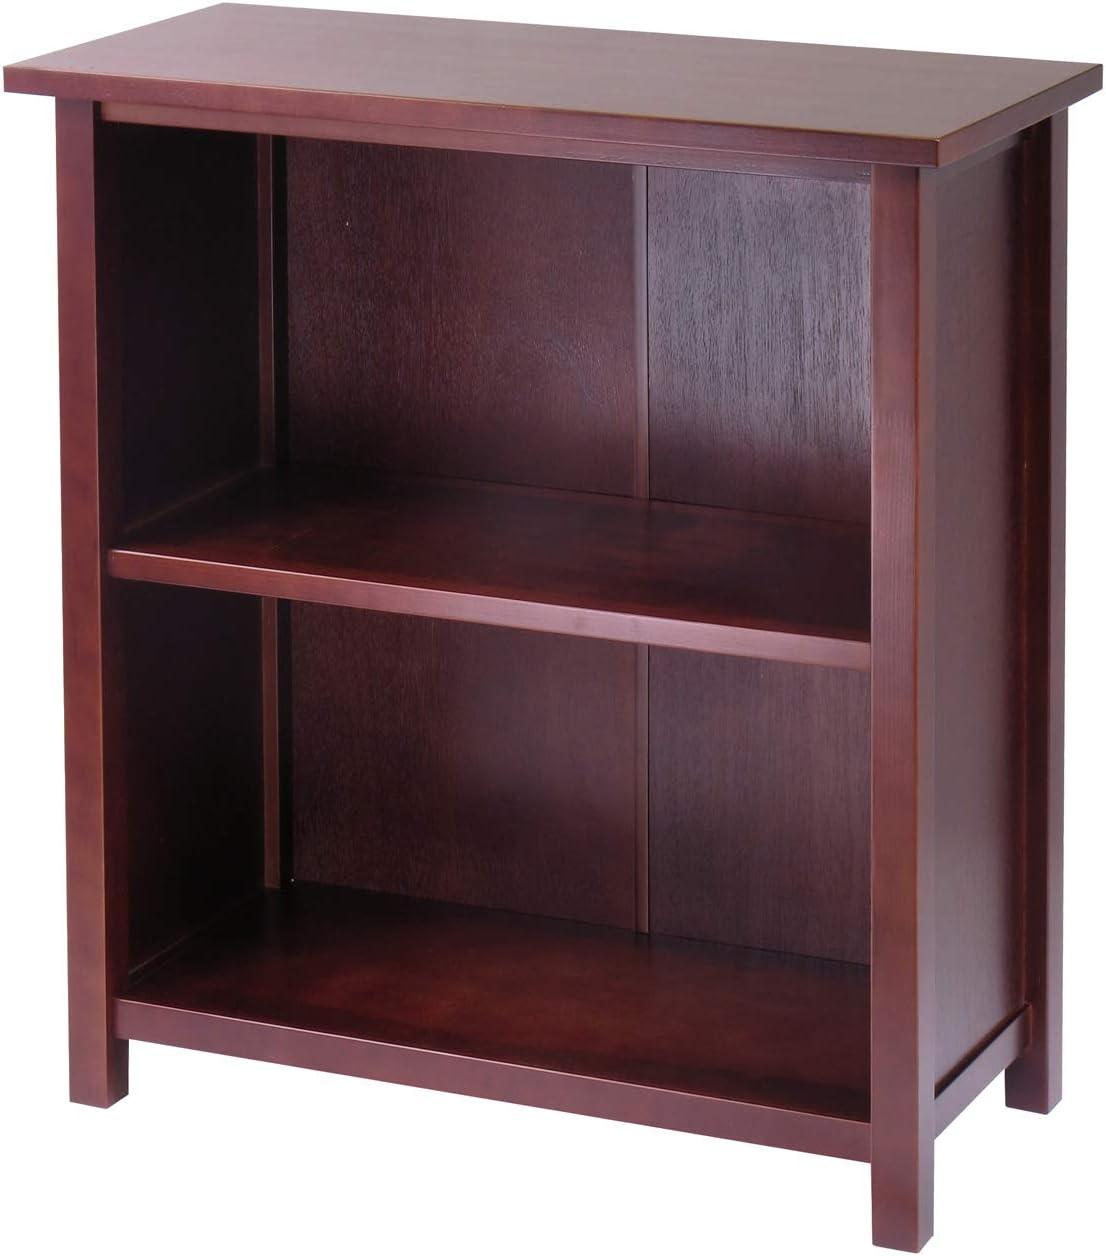 Winsome Milan Shelf, medium, Walnut